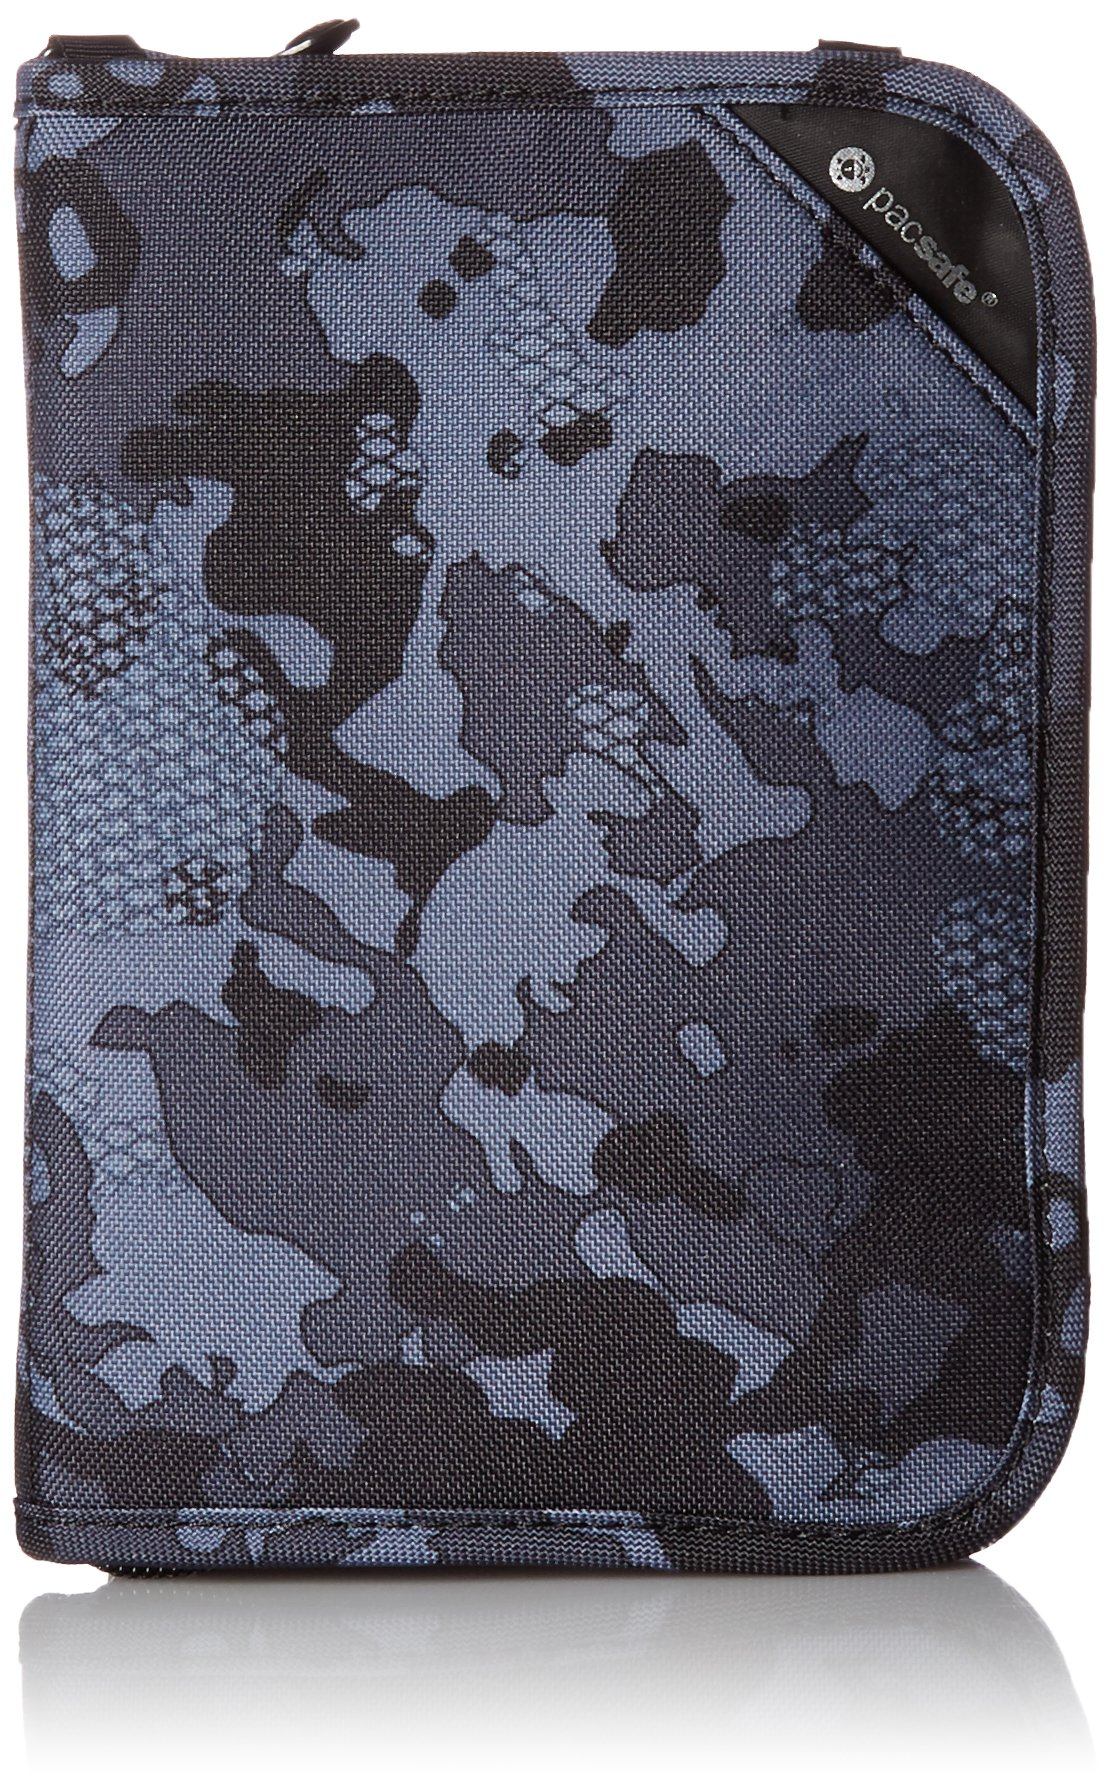 Pacsafe RFIDsafe V150 Anti-Theft RFID Blocking Compact Passport Wallet, Grey Camo